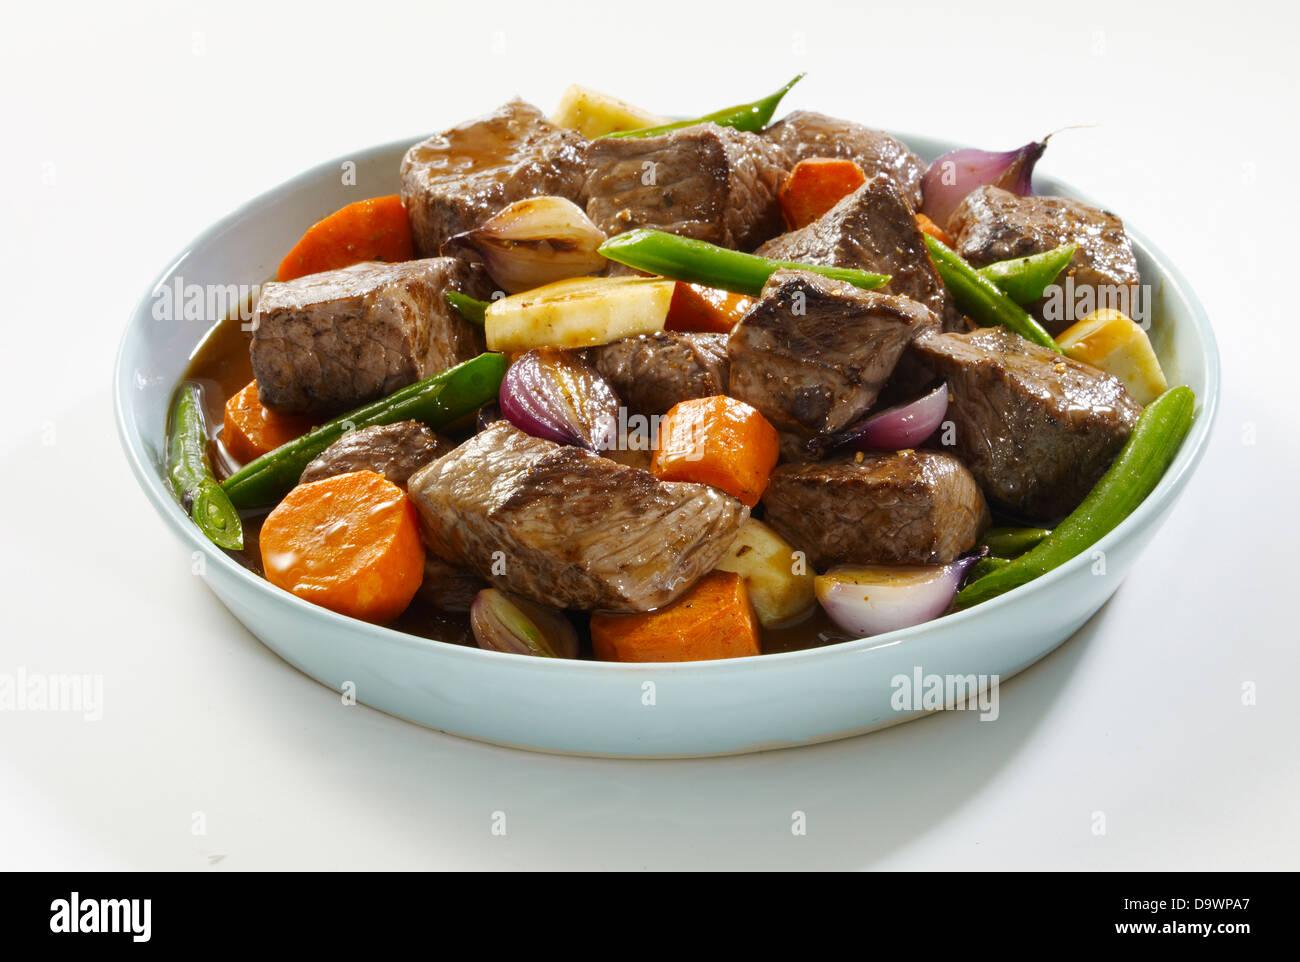 guiso de carne de res Imagen De Stock